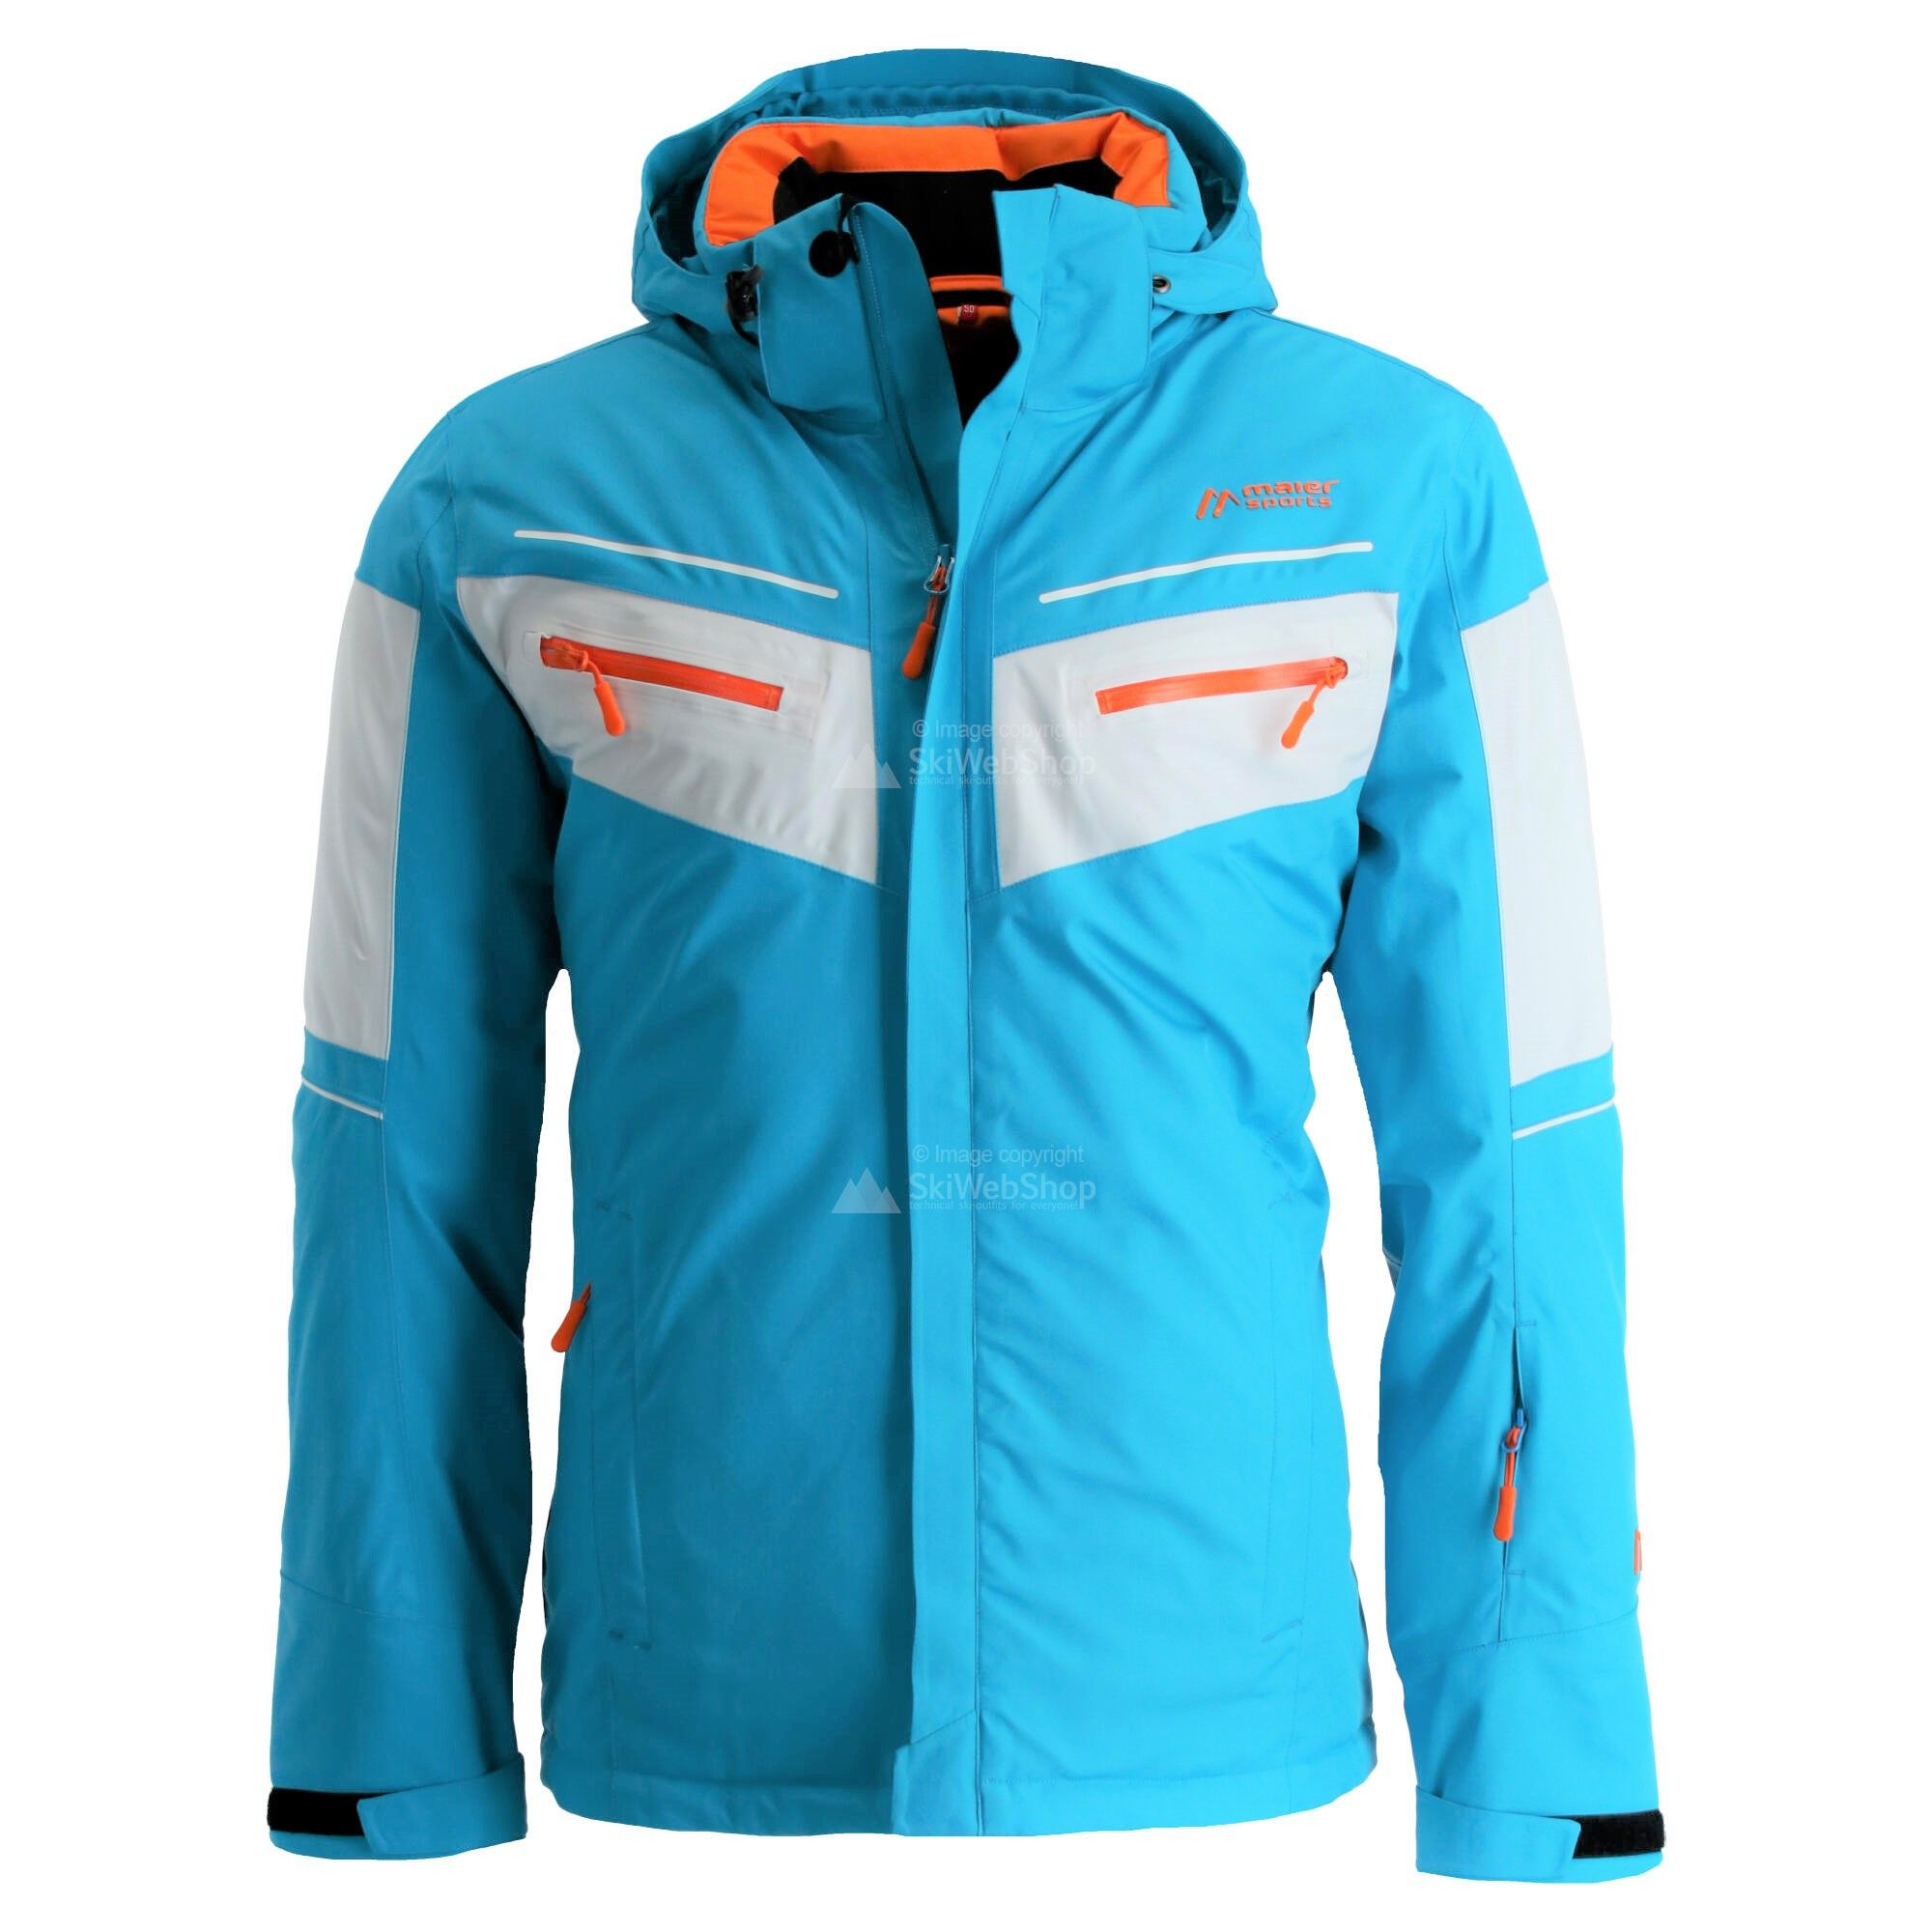 Maier Sports, Podkoren, ski jas, grote maten, heren, methyl